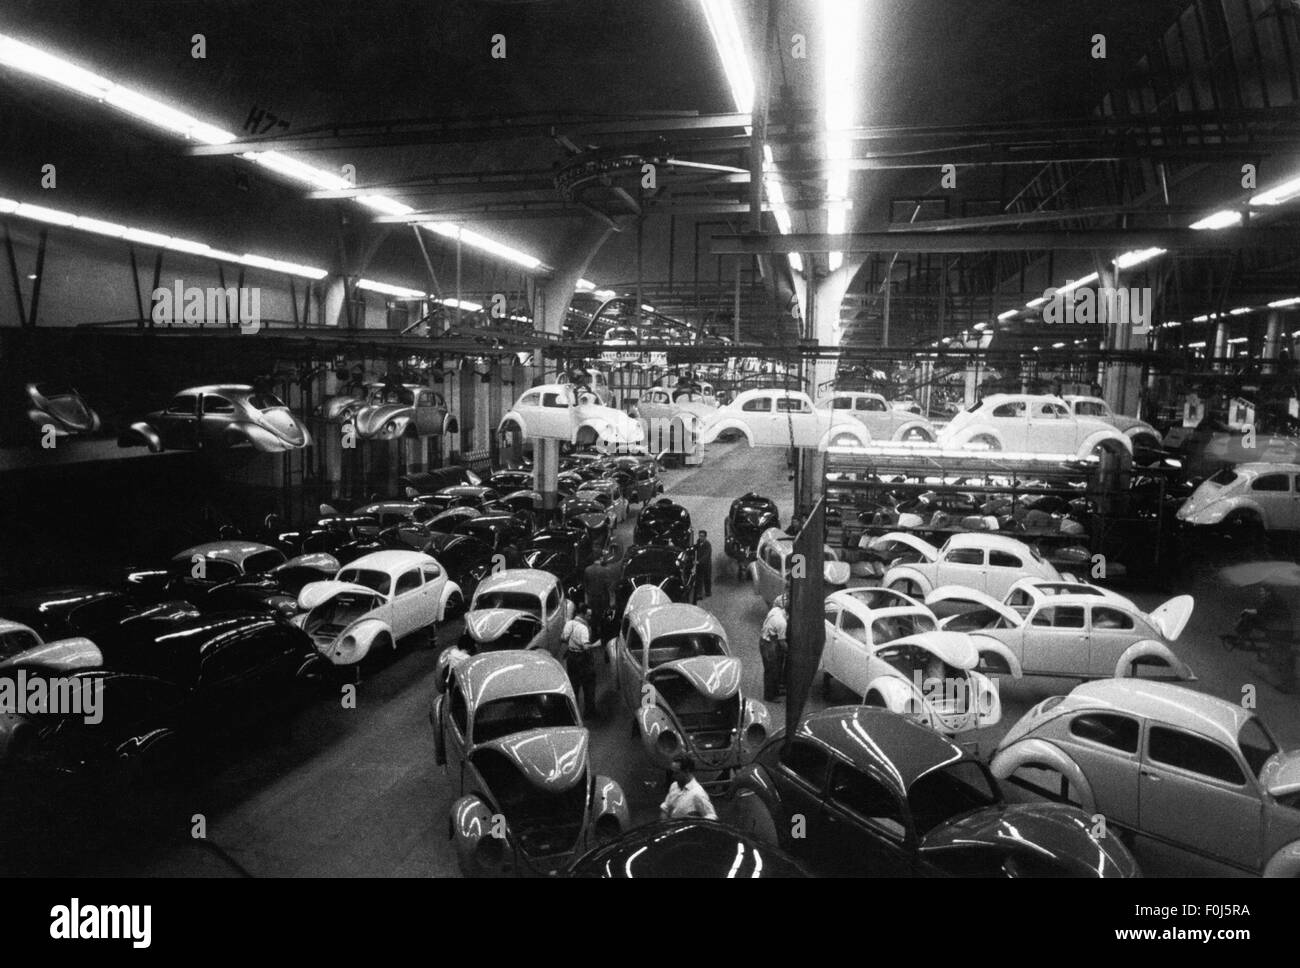 industry, car industry, Volkswagen, Volkswagen plant Wolfsburg, interior view, painting hall, VW Beetle version Stock Photo